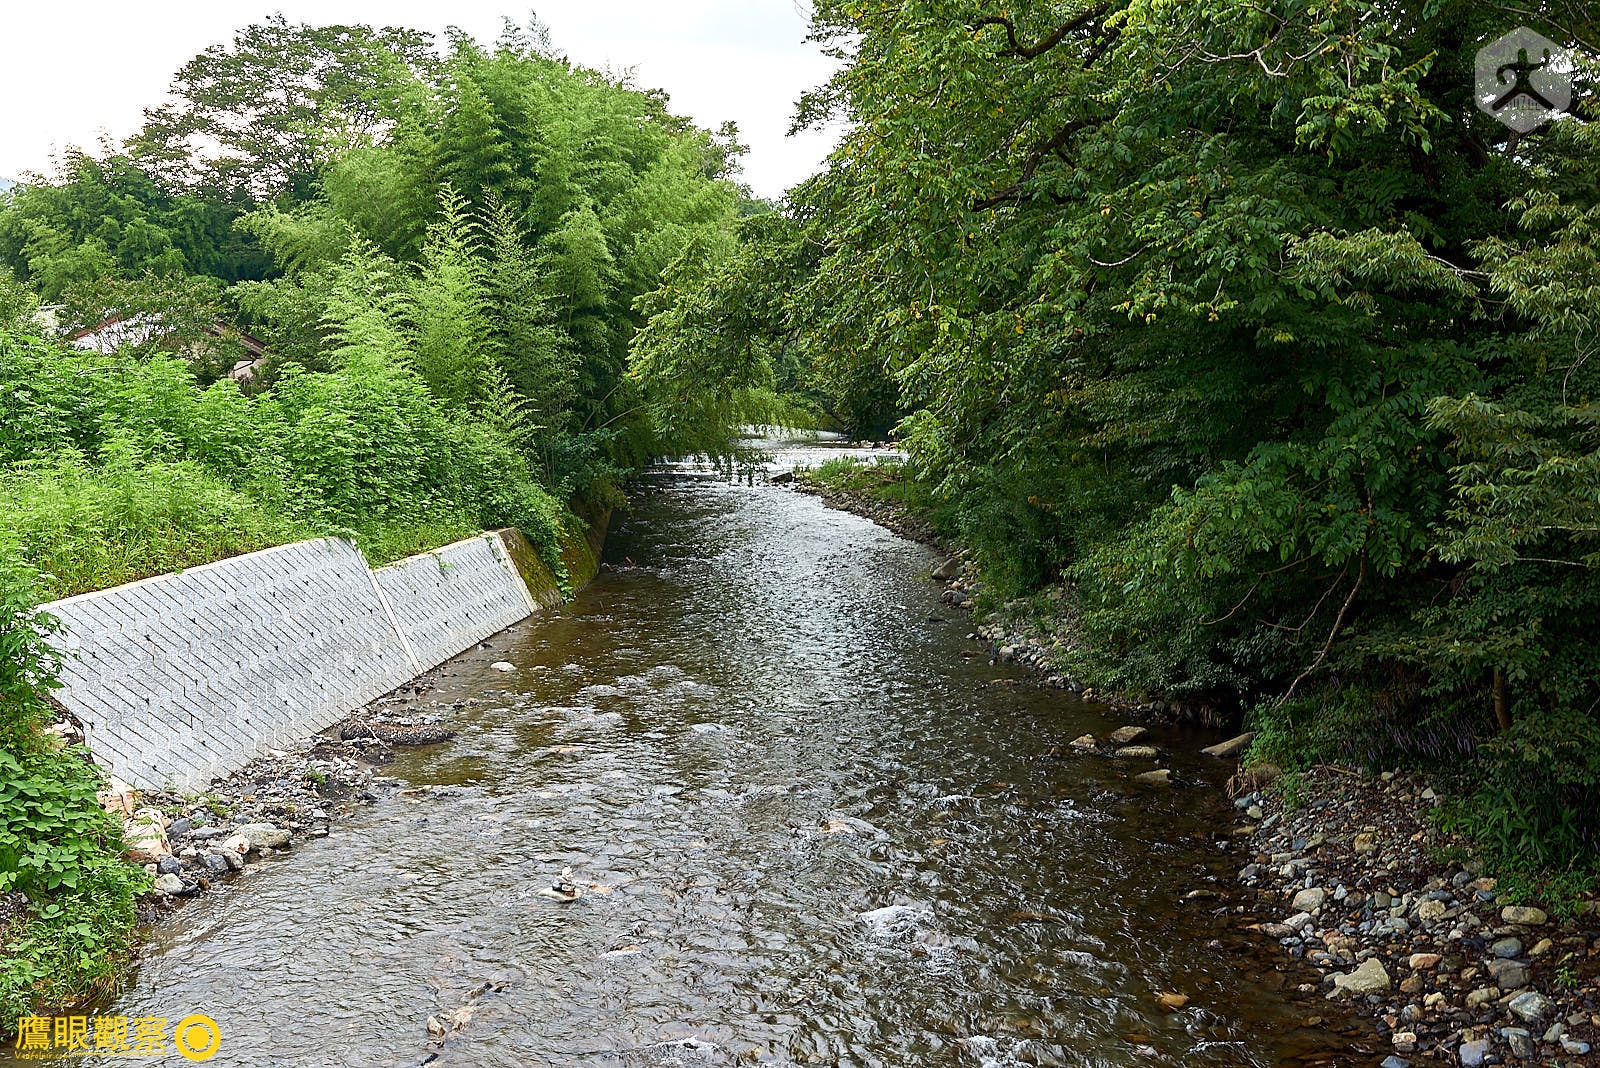 Japan Travel River Stream 20190817153507 日本廢棄小學 🚗 RV 休旅車露營、森林探險之旅(櫪木縣鹿沼市立久我小學)🇯🇵⛺️